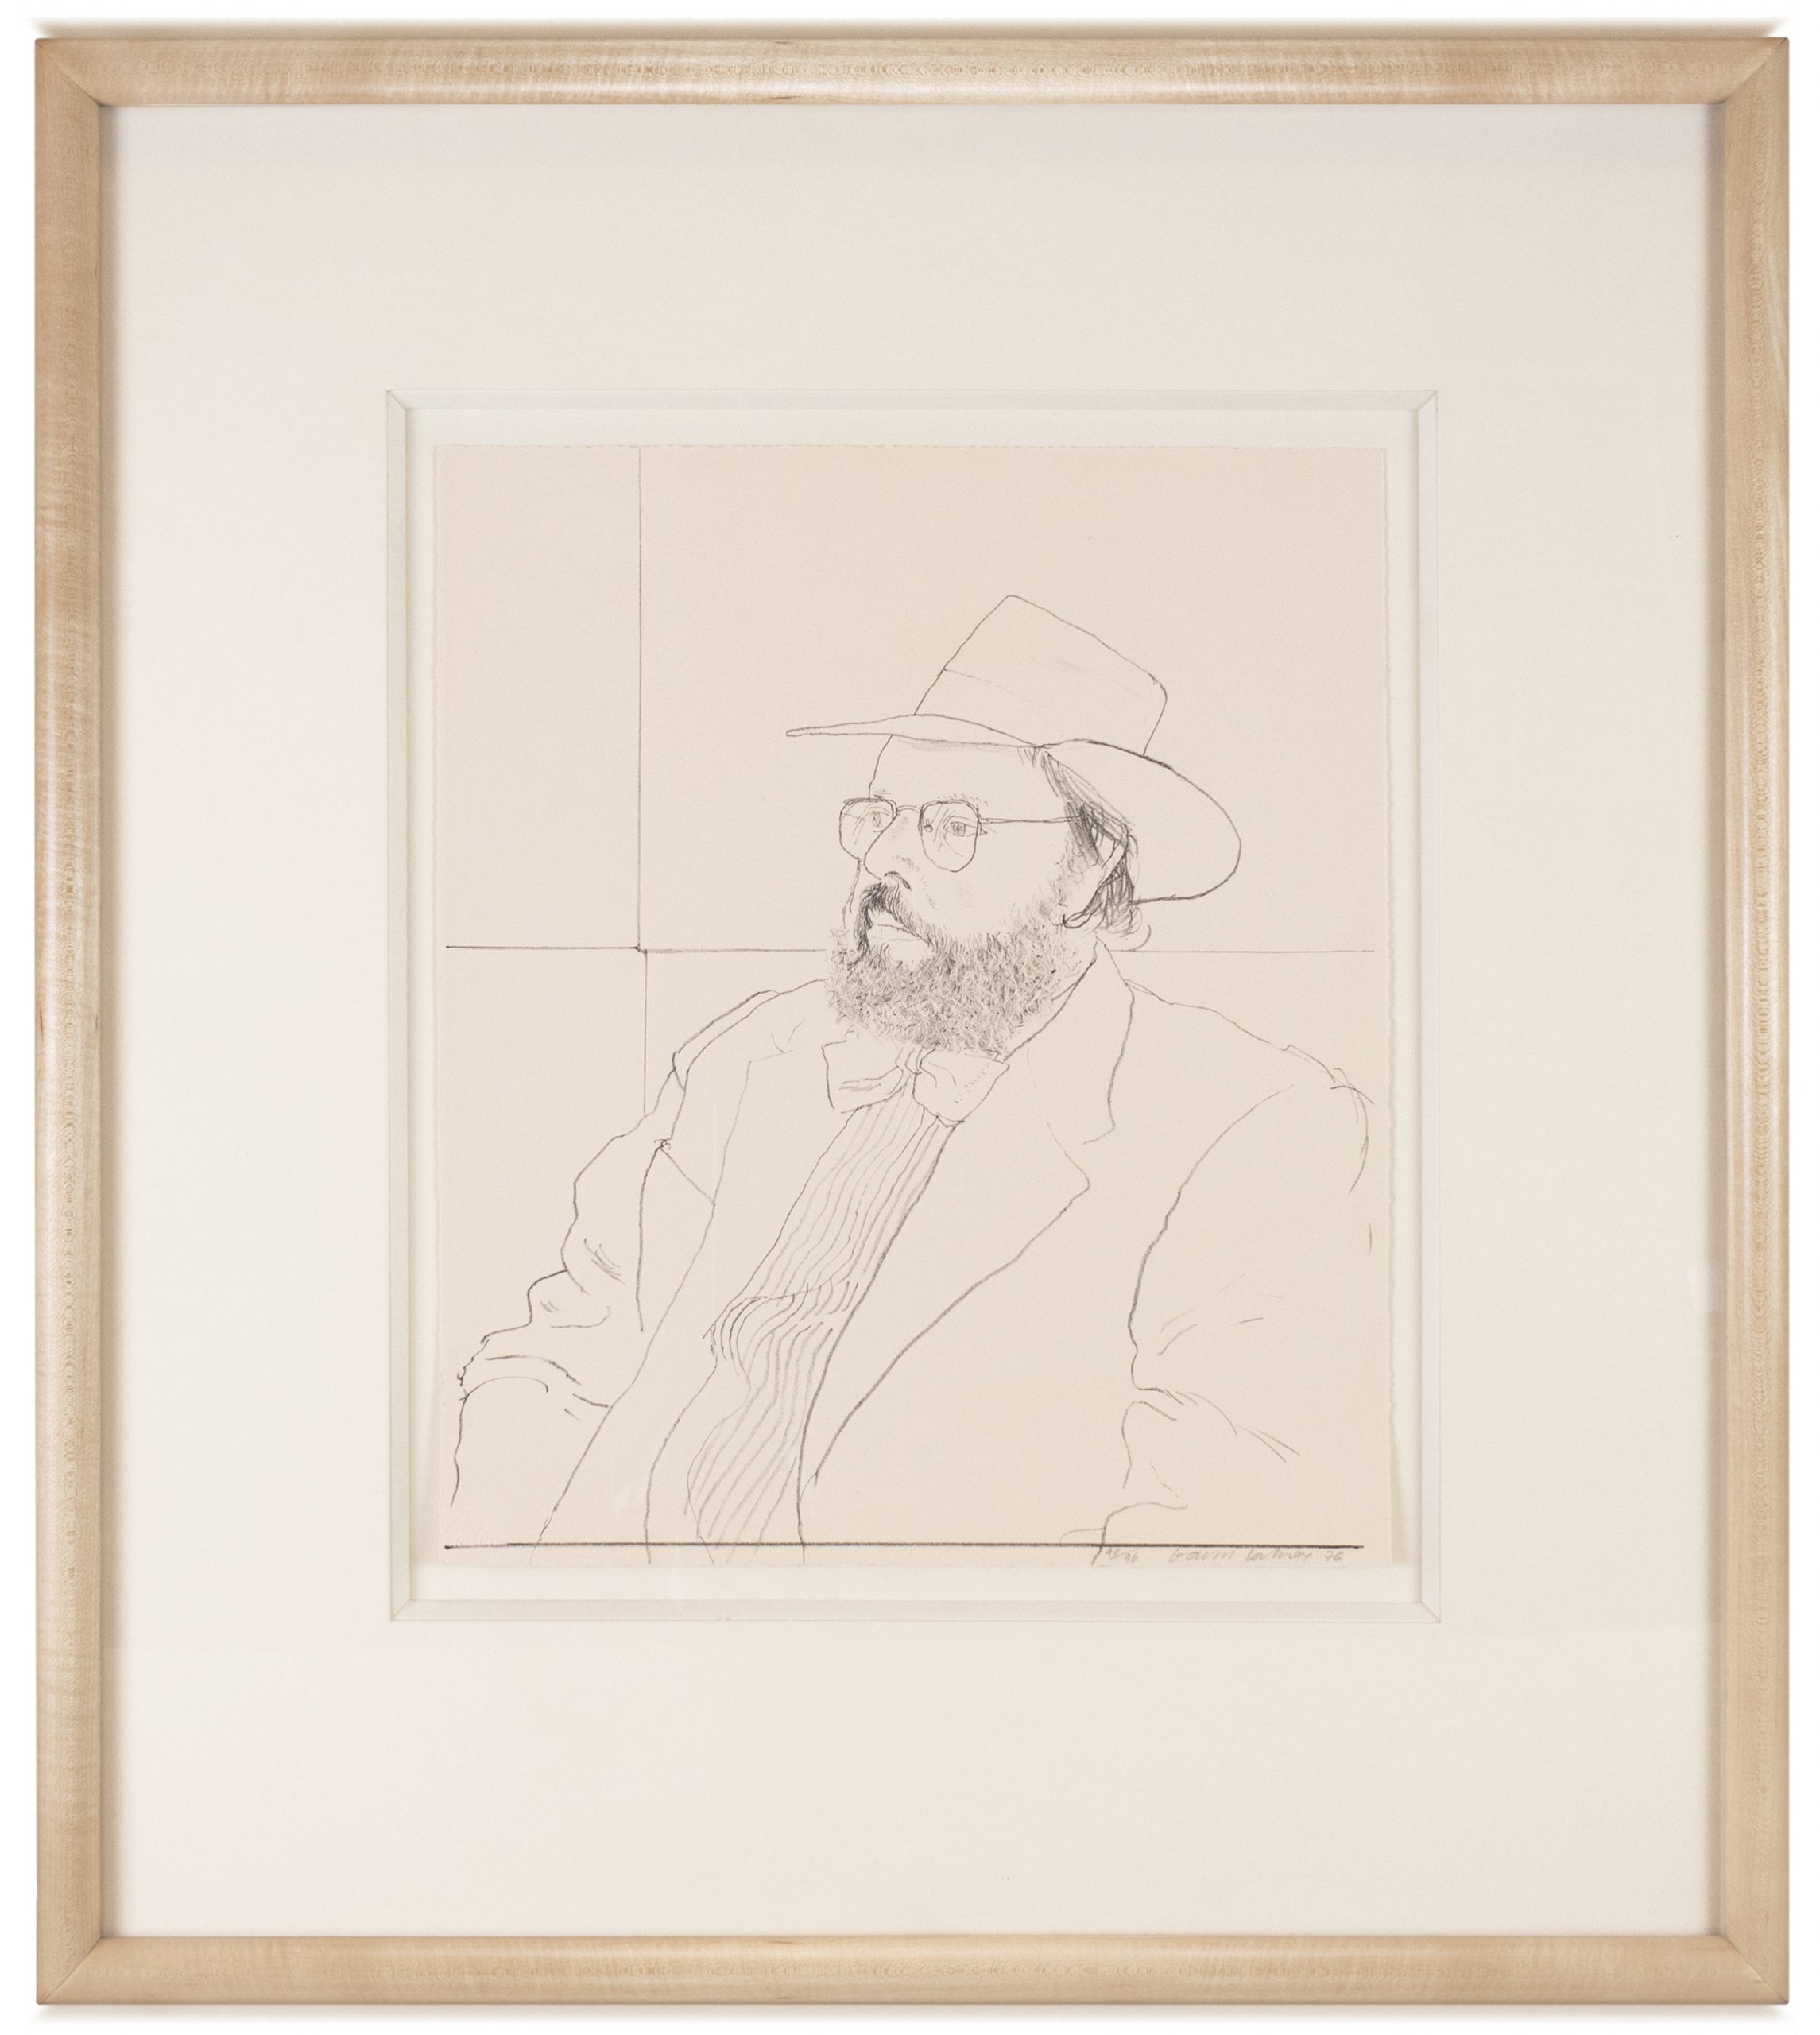 Henry Geldzahler with Hat by David Hockney